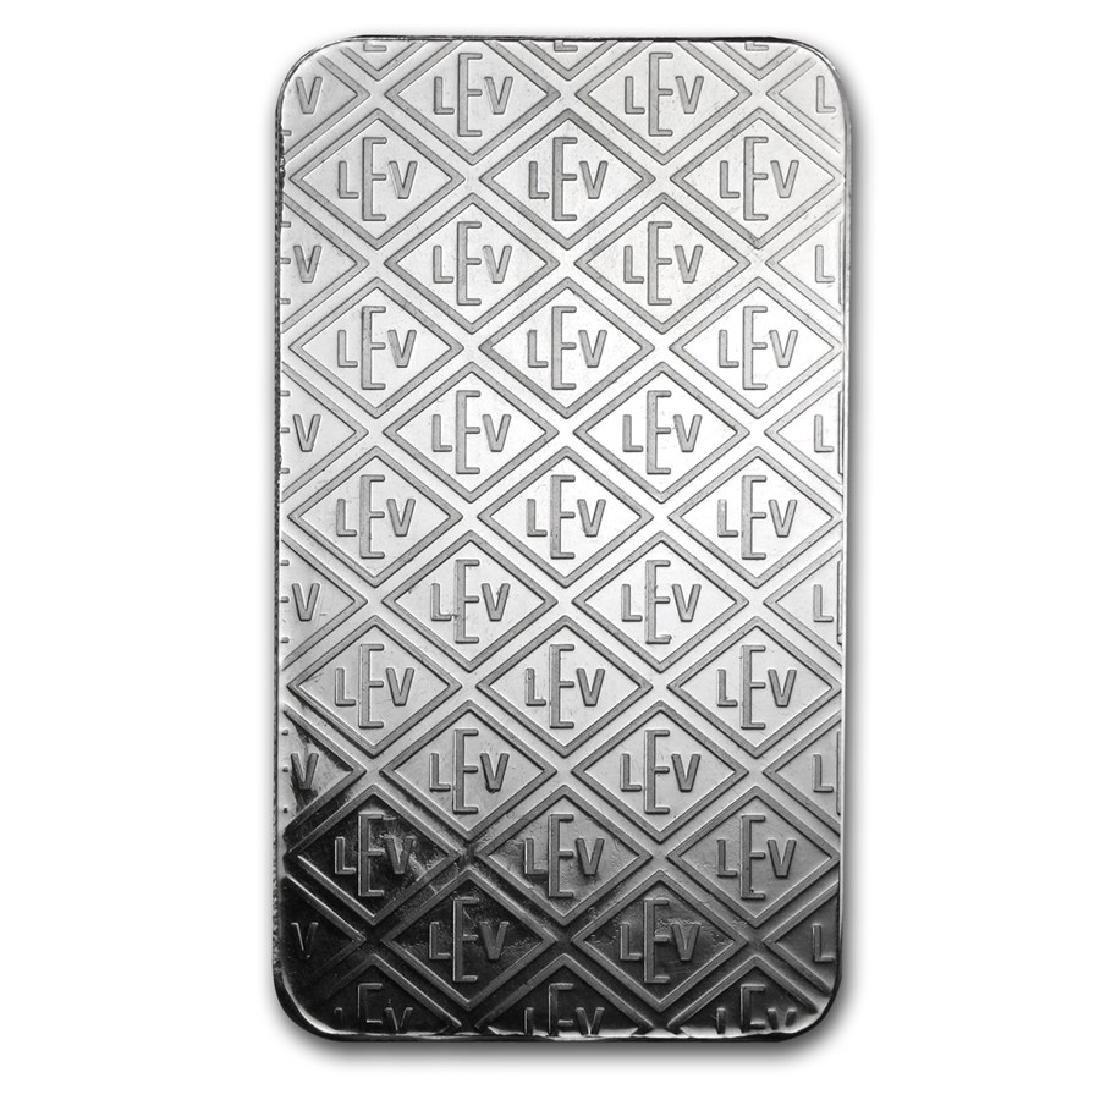 Genuine 10 oz 0.999 Fine Silver Bar - Geiger Security - 2